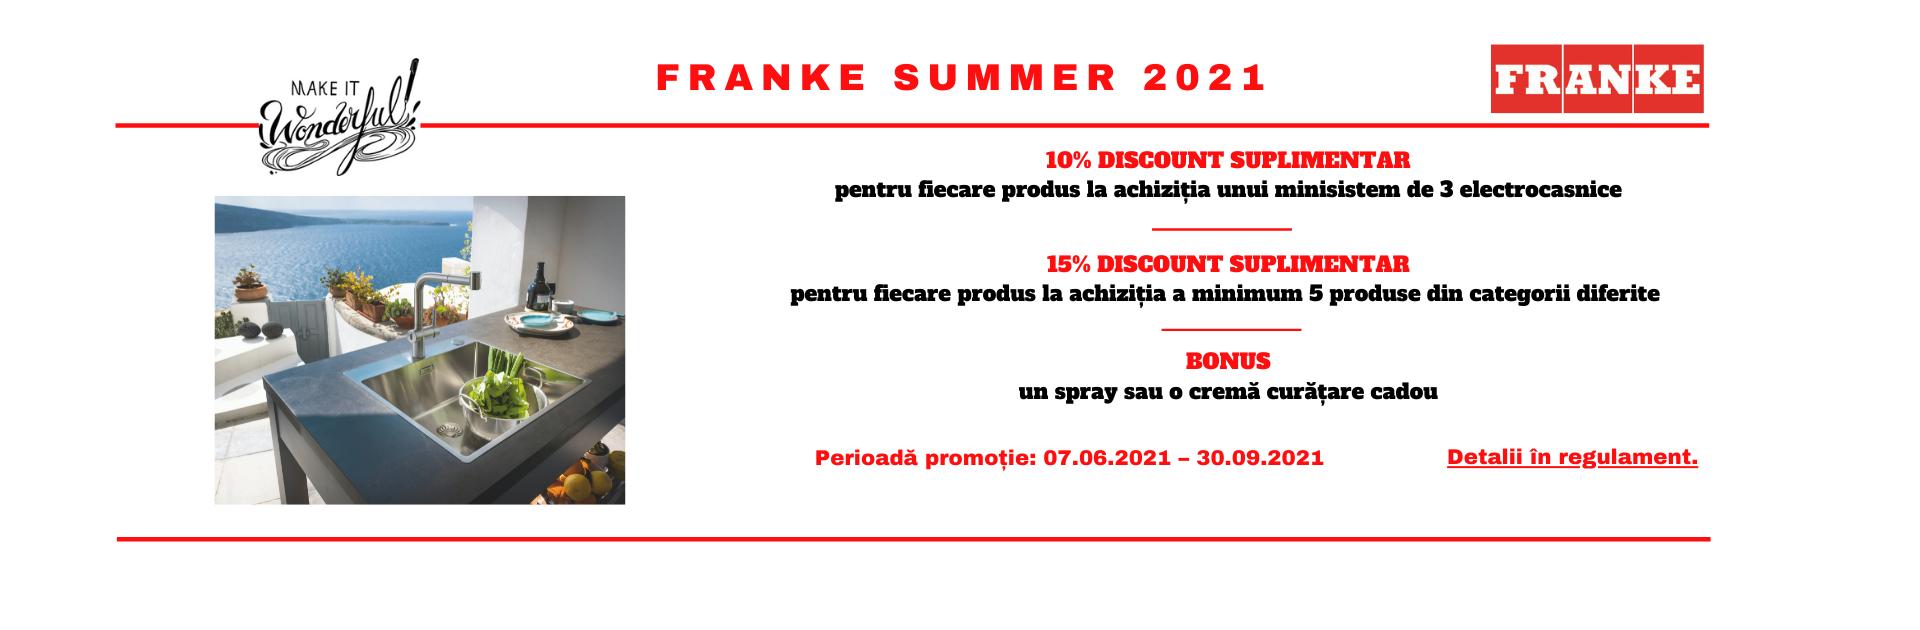 Promotia Franke SUMMER 2021